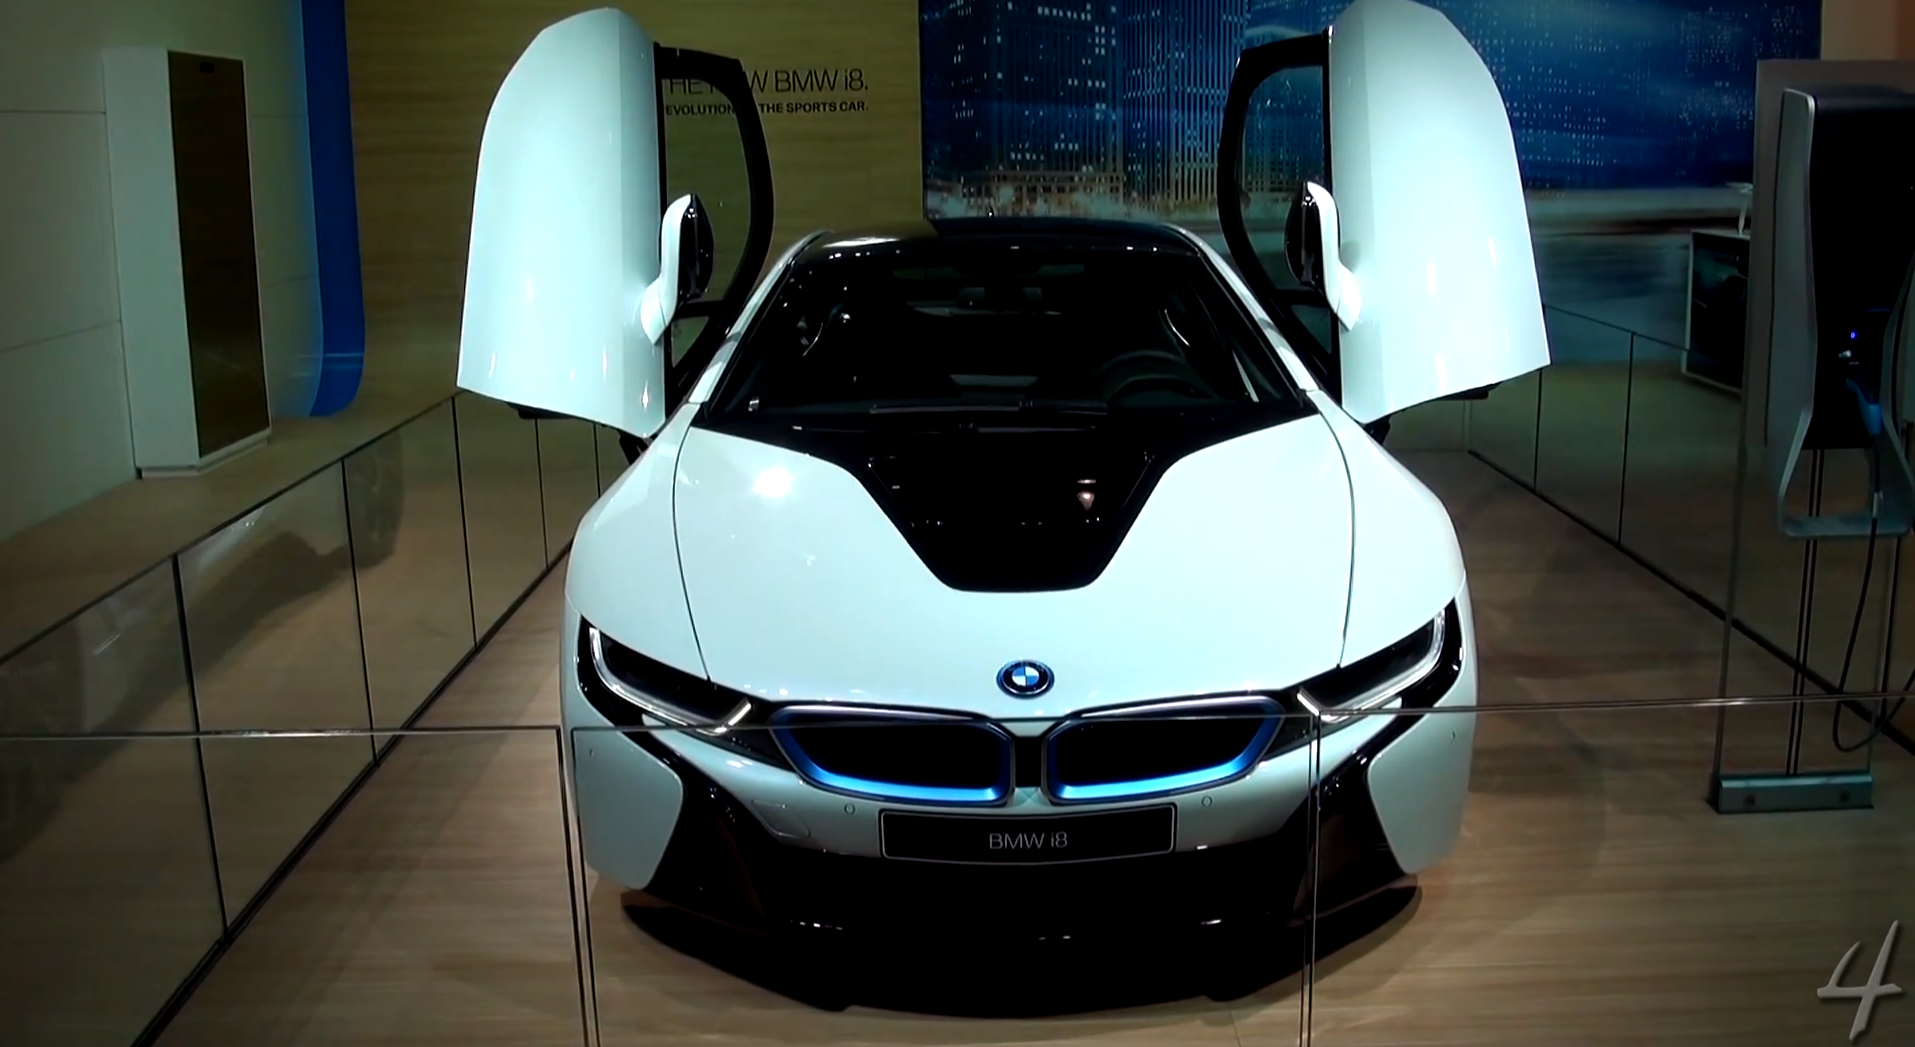 Bmw I8 Caught On Film At The 2013 Dubai Motor Show Autoevolution